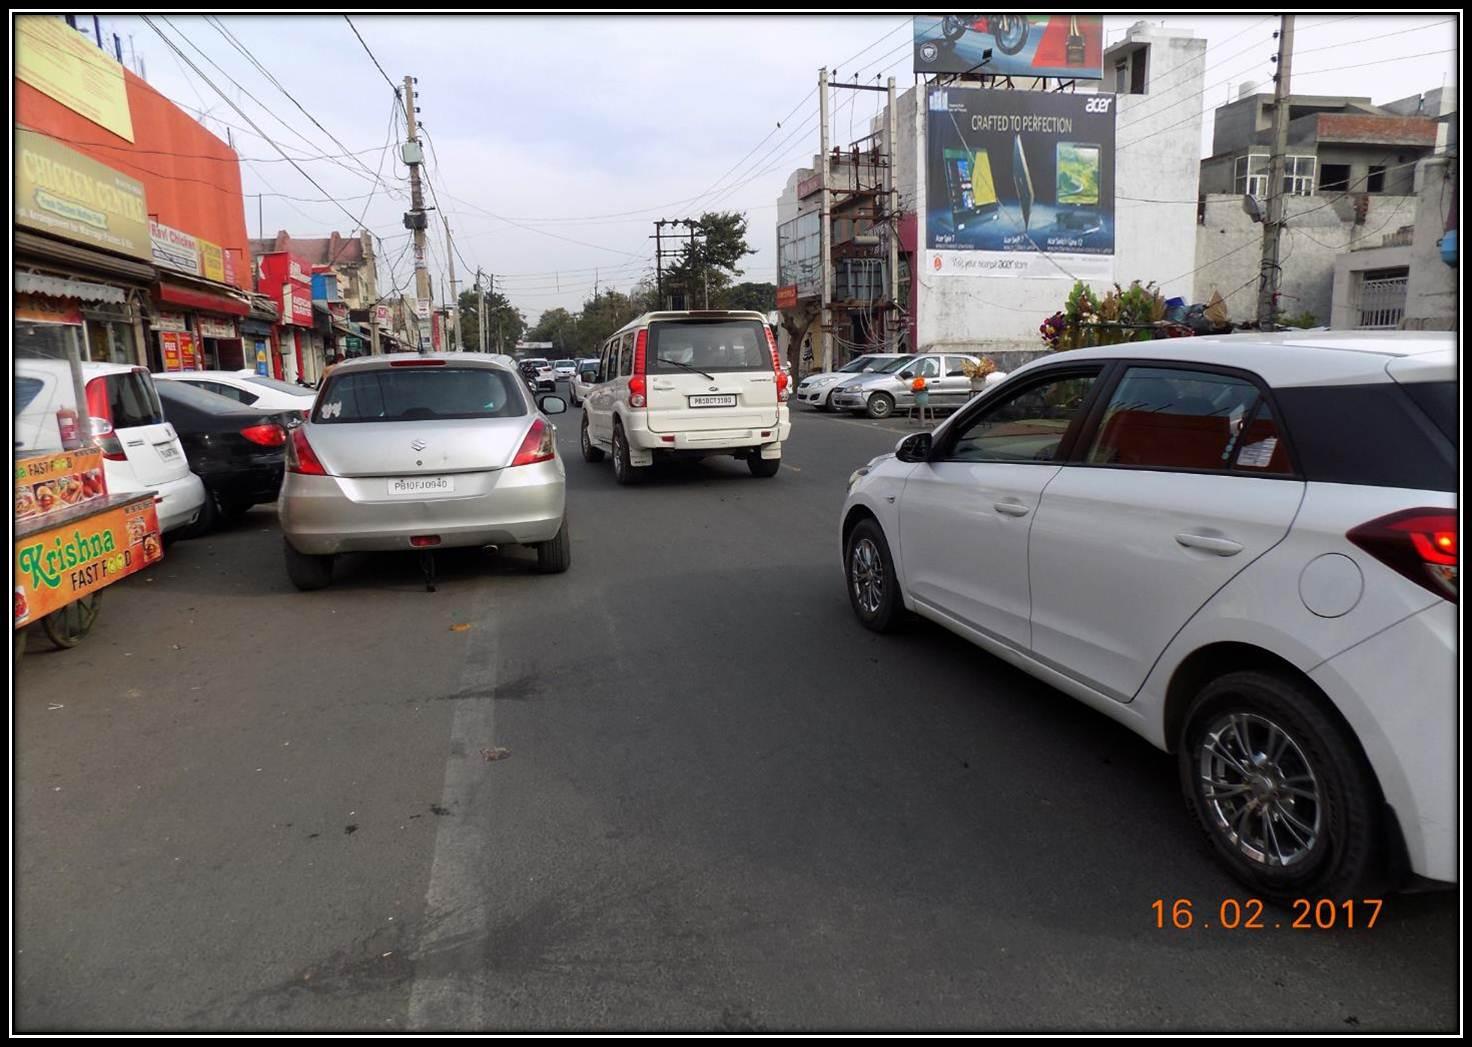 Model town Market Near Gulati Chowk, Ludhiana